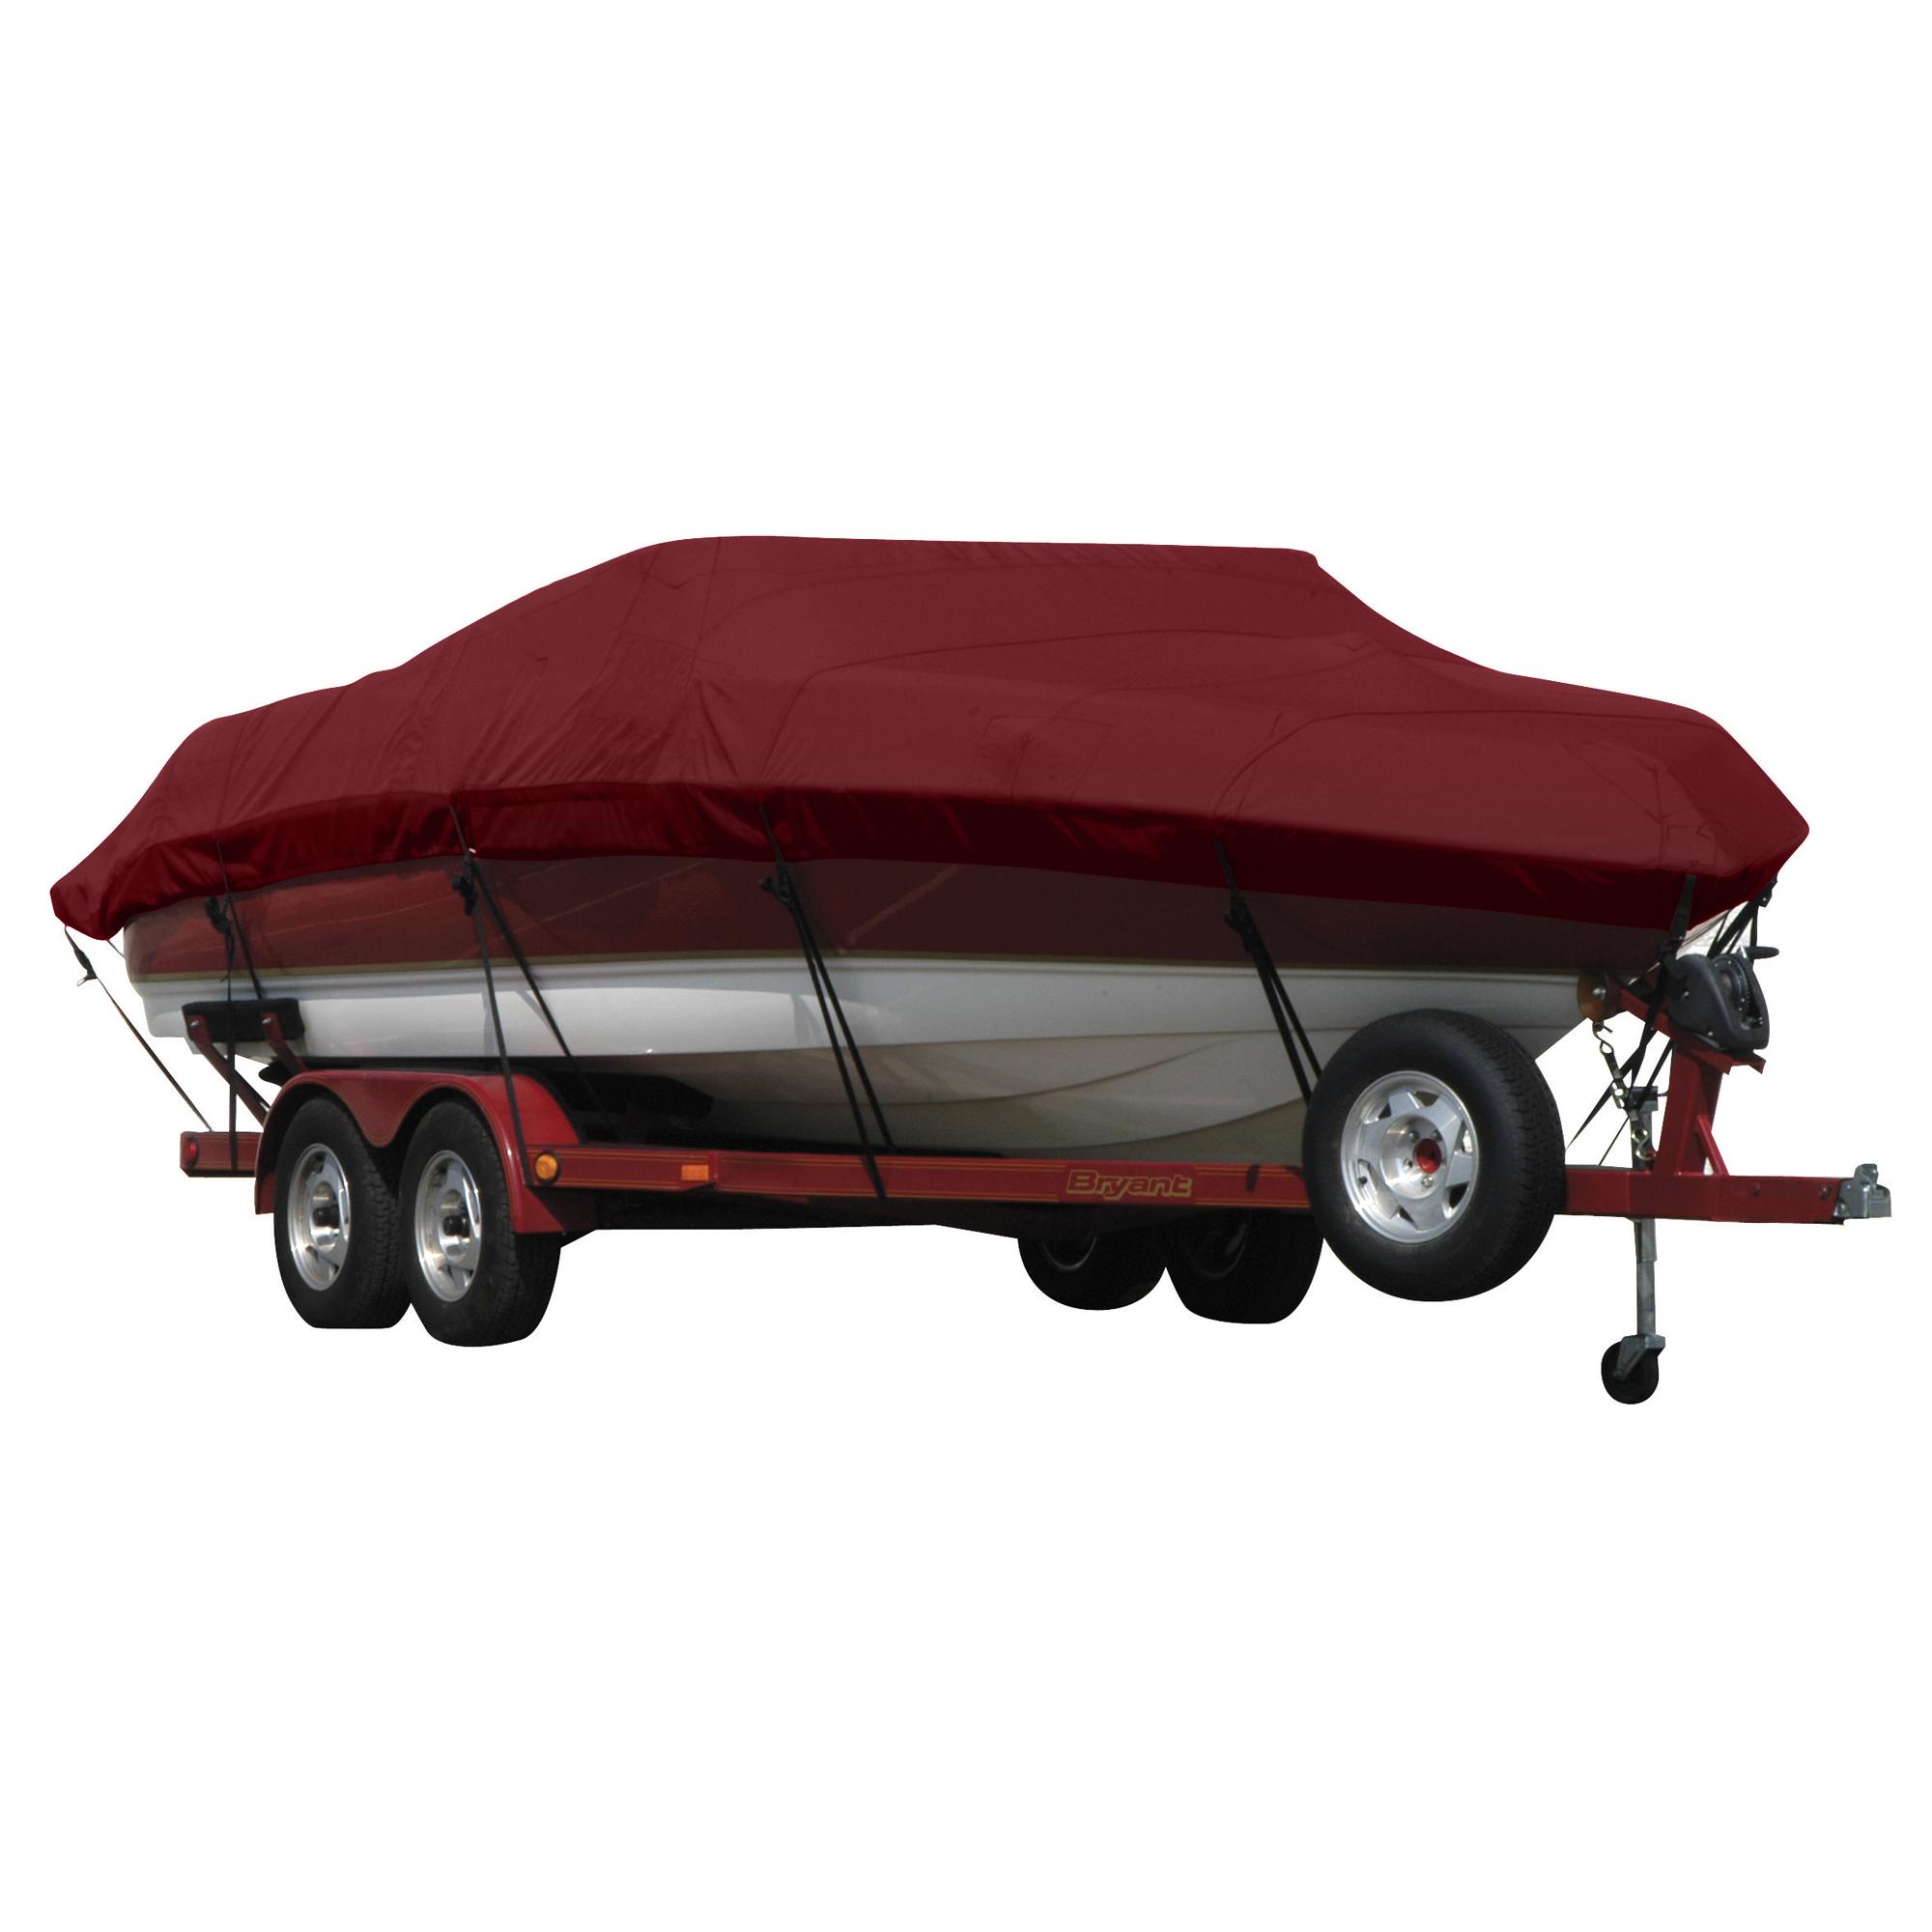 Exact Fit Covermate Sunbrella Boat Cover for Princecraft Super Pro 176 Super Pro 176 Fish N Promenade W/Ski Rope Guard O/B. Burgundy